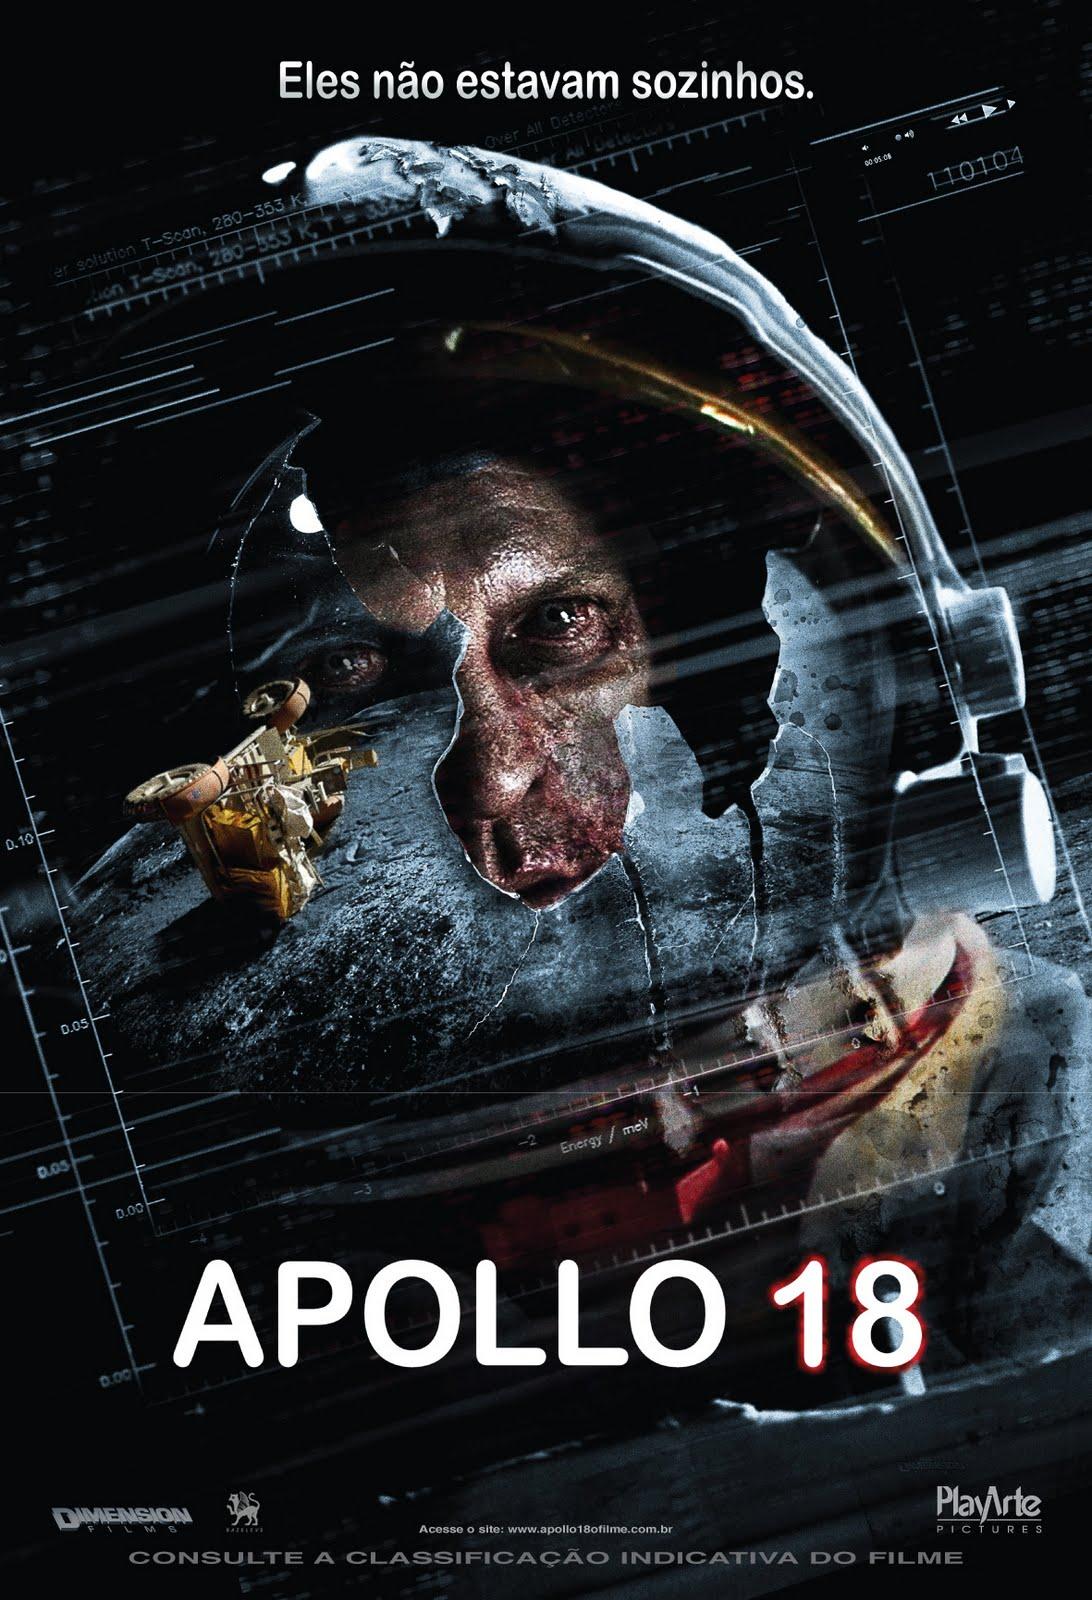 apollo 18 cine planeta